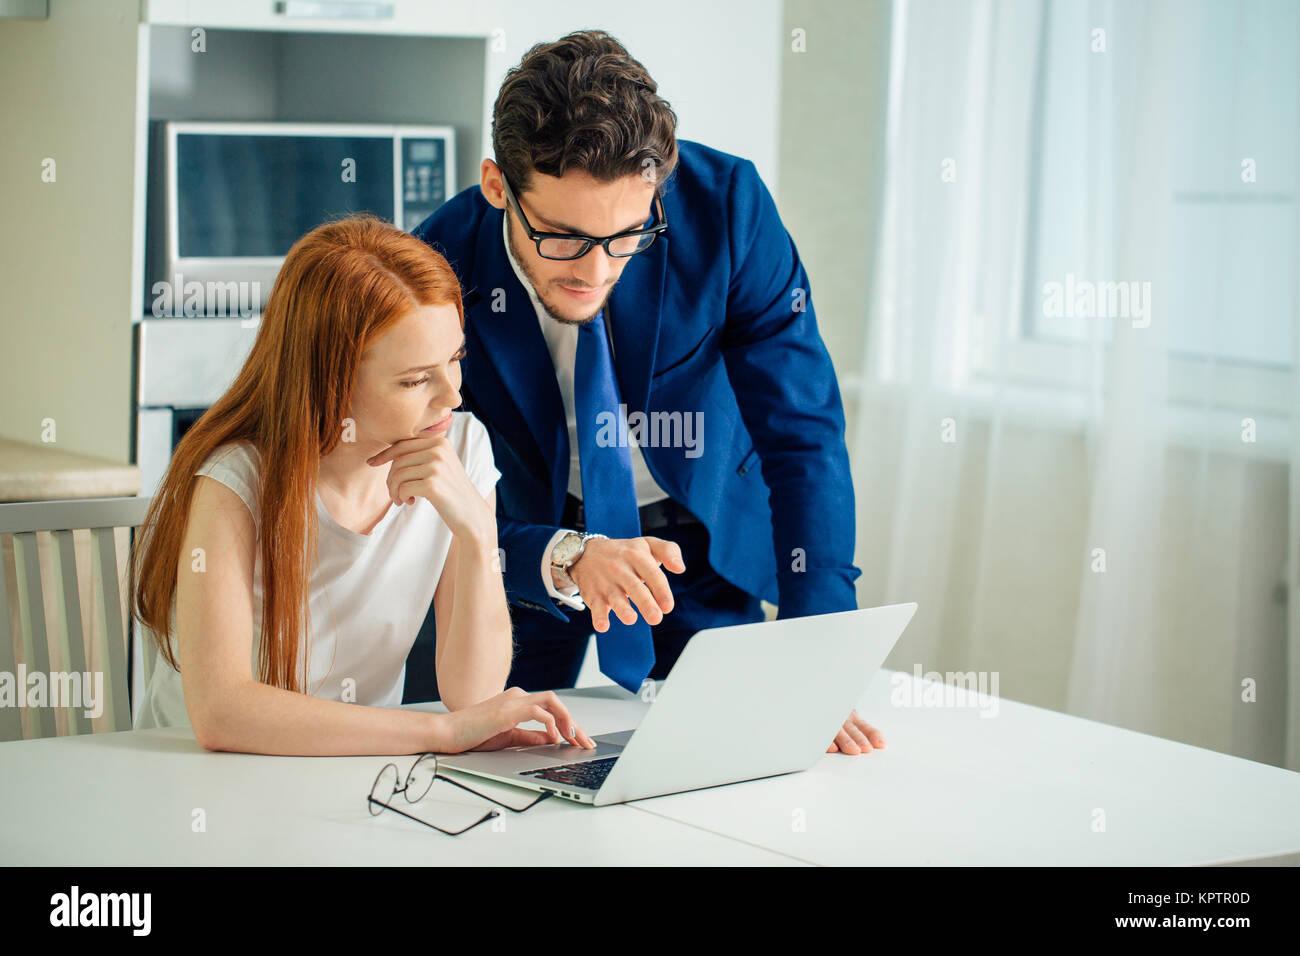 Business man explaining something to woman with laptop - Stock Image